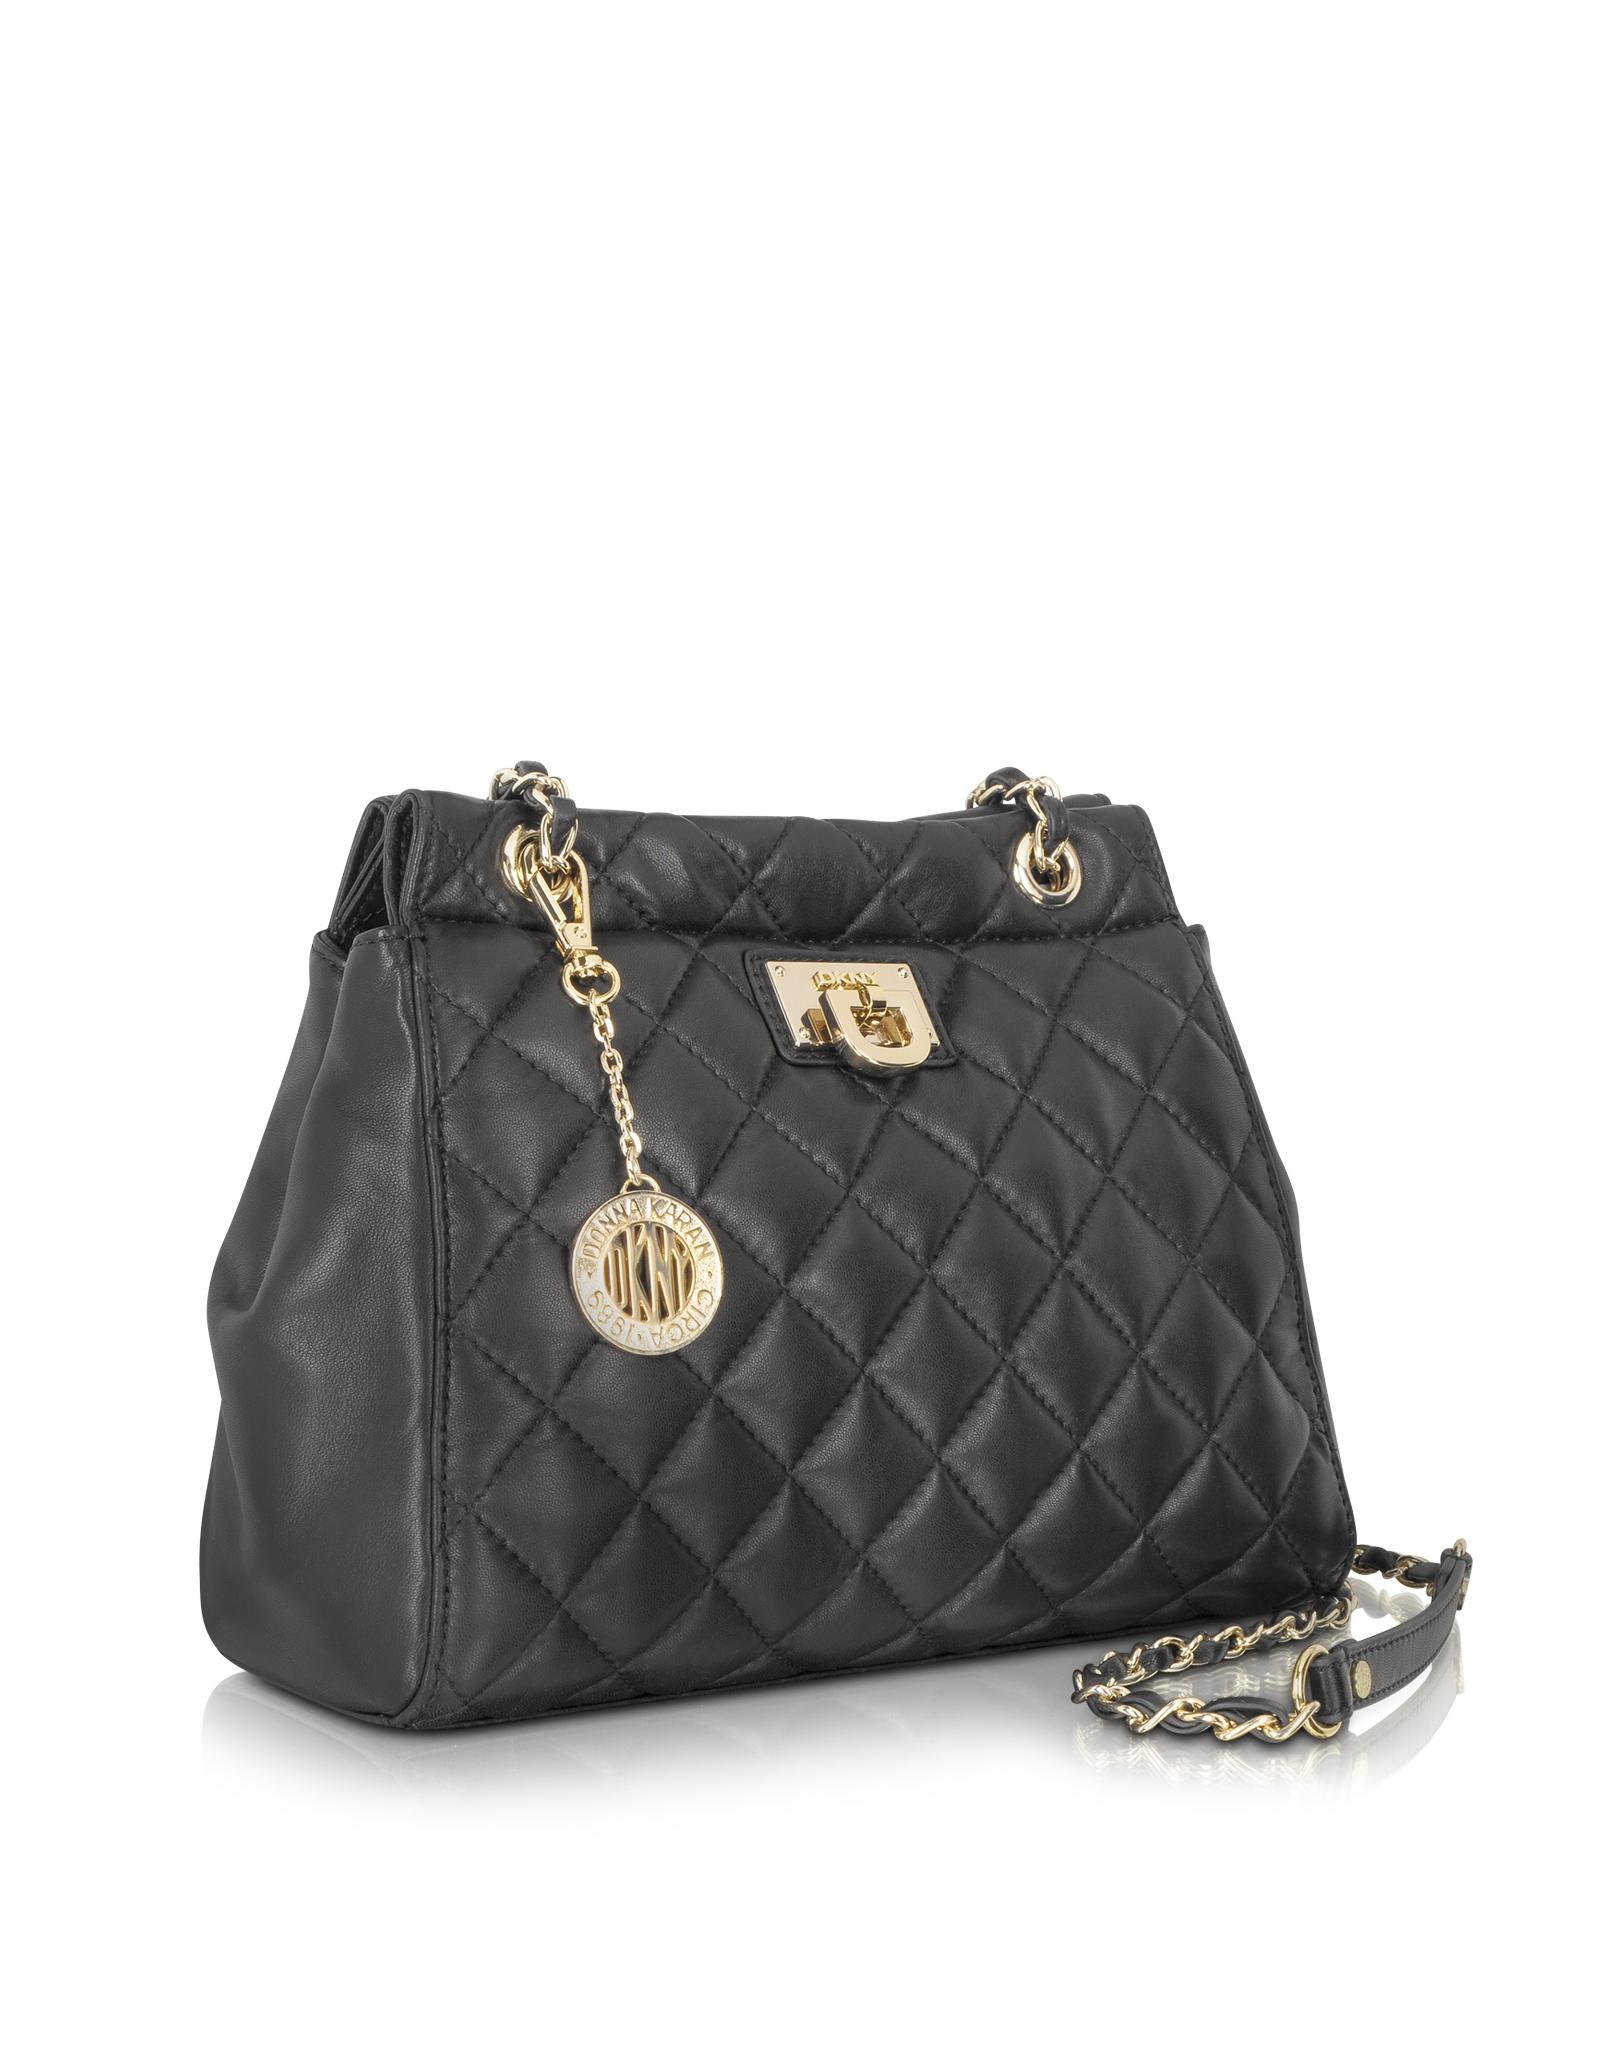 Dkny Gansevoort Quilted Nappa Large Snap Crossbody Bag in Black | Lyst : dkny black quilted handbag - Adamdwight.com